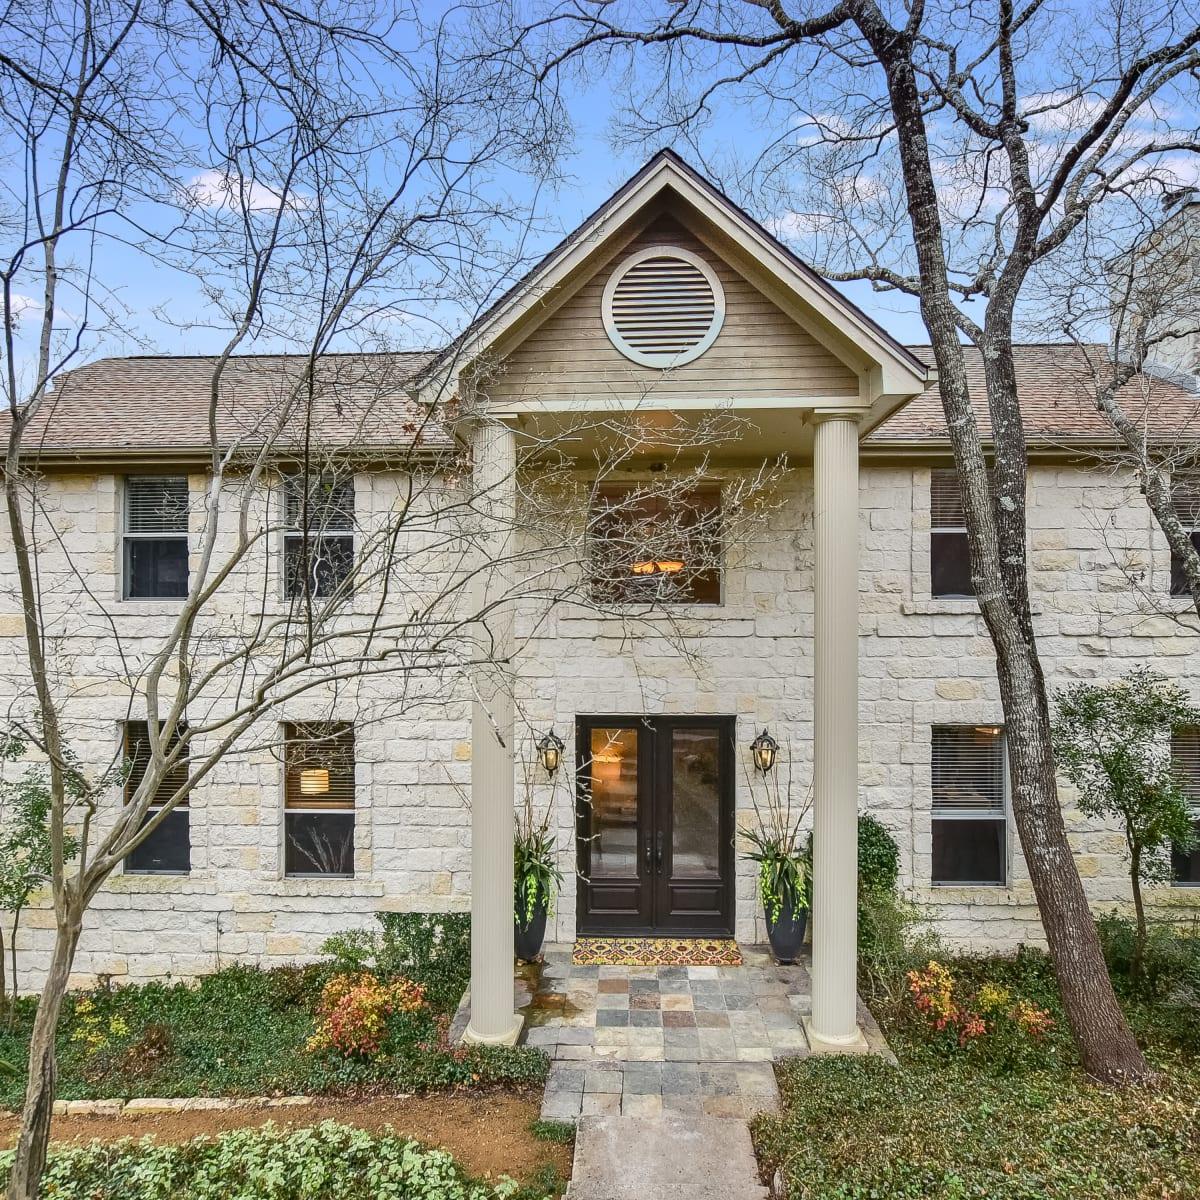 Austin house_9606 Bitternut